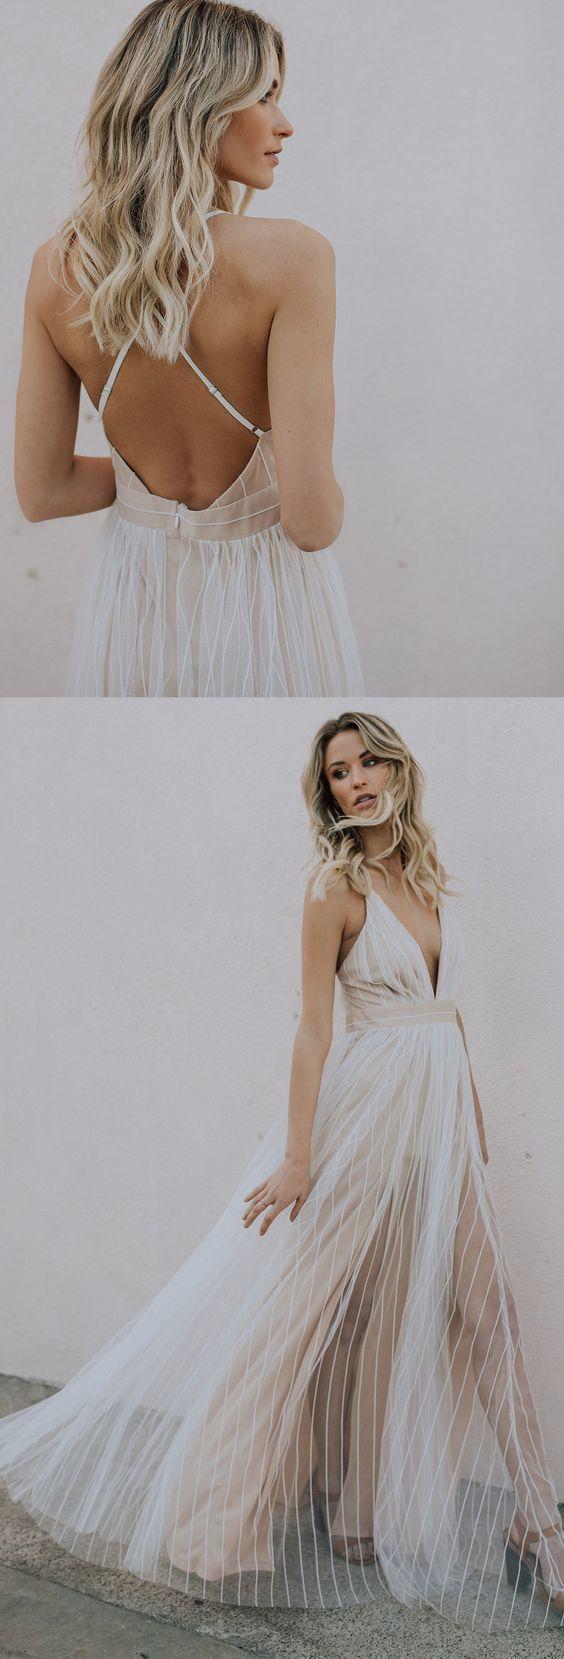 A-Line Deep V-Neck Floor Length Light Champagne Tulle Wedding Dress